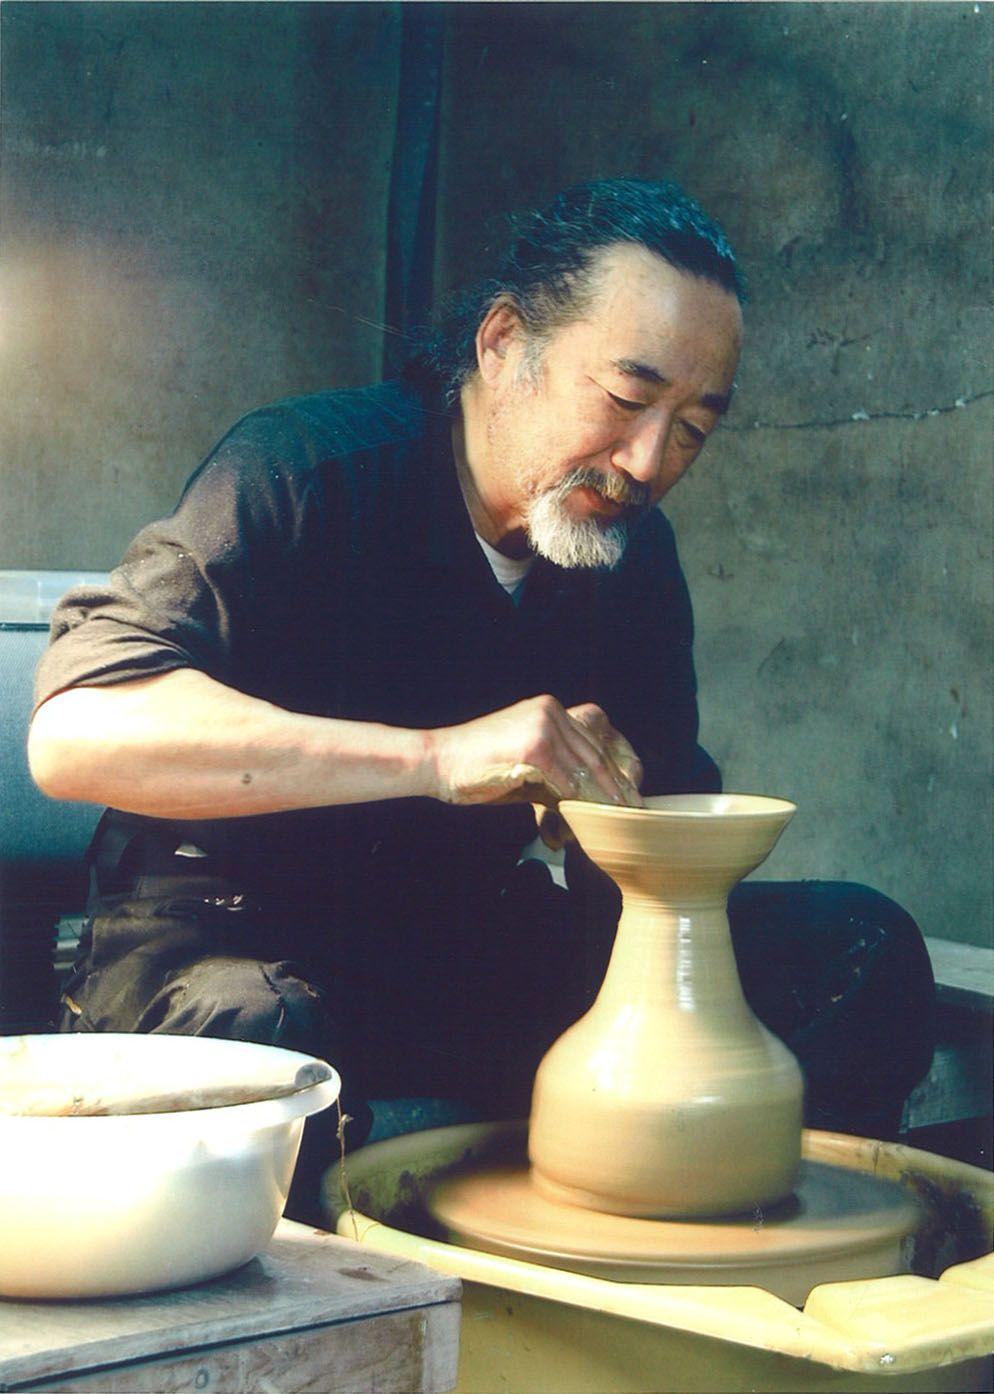 Sensual potters craftsmanship